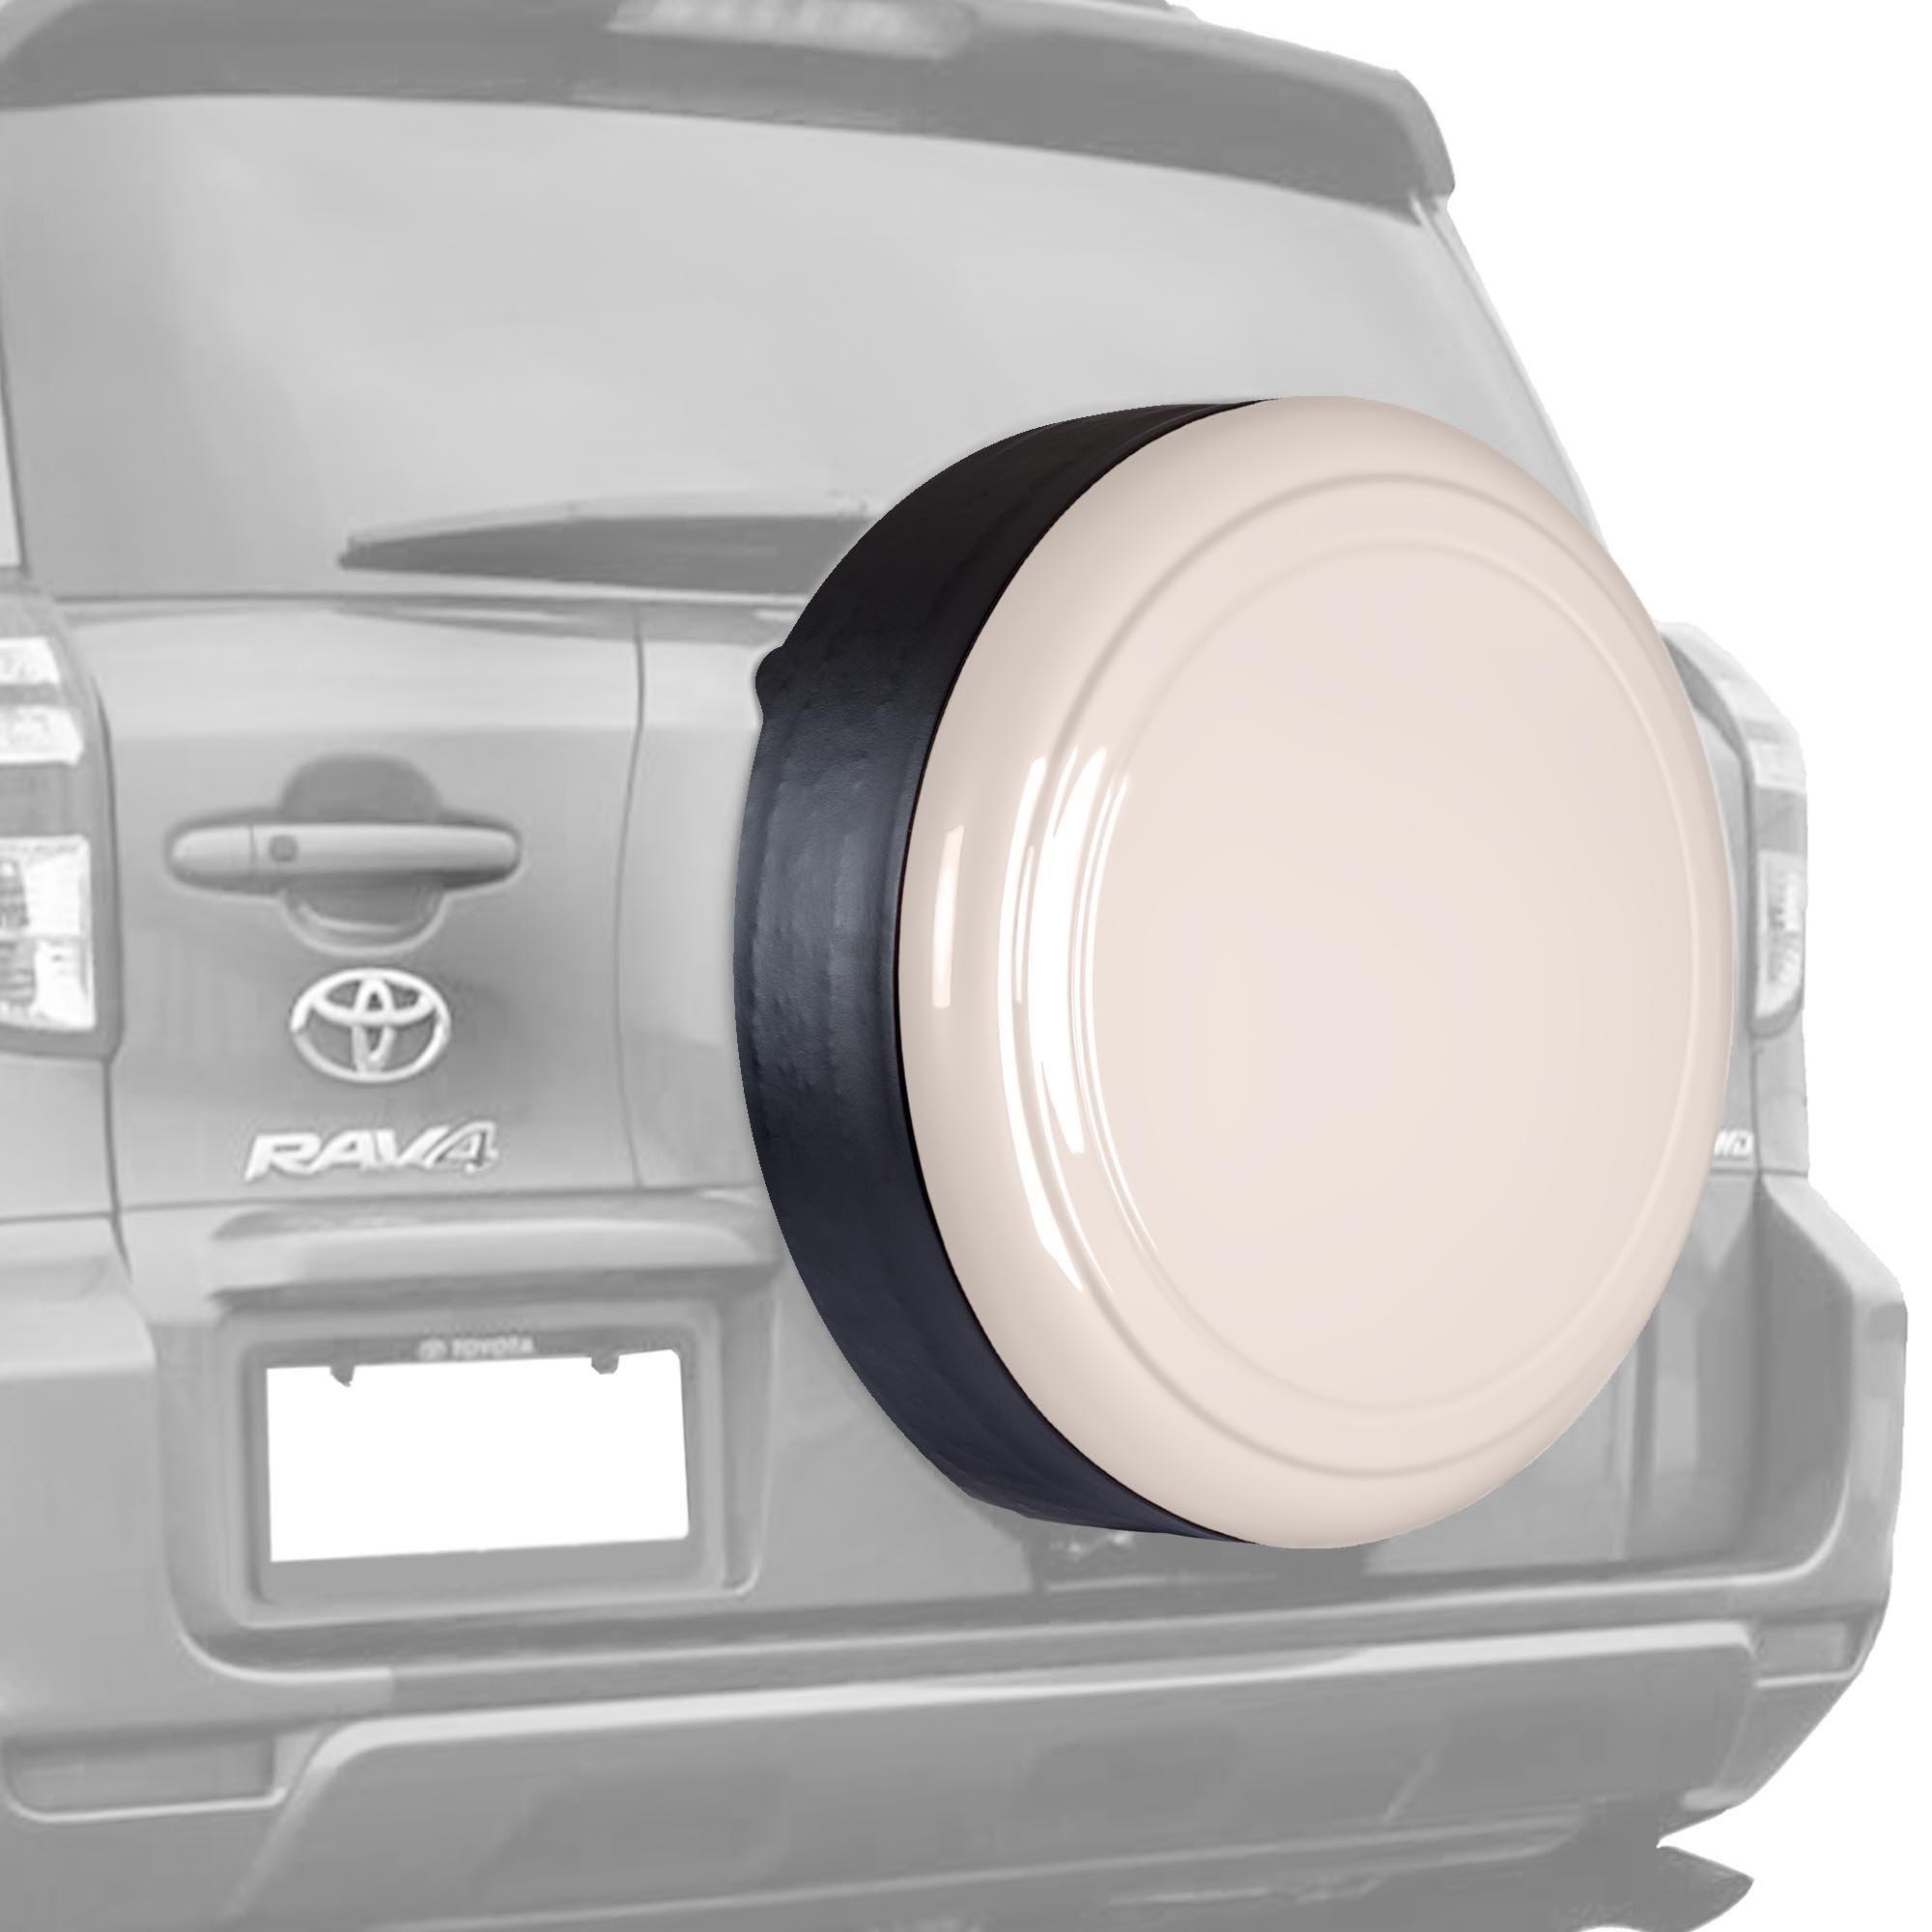 06-12 Toyota RAV4 - 28'' Color Matched Rigid Tire Cover (Plastic Face & Vinyl Band) - Savannah Metallic